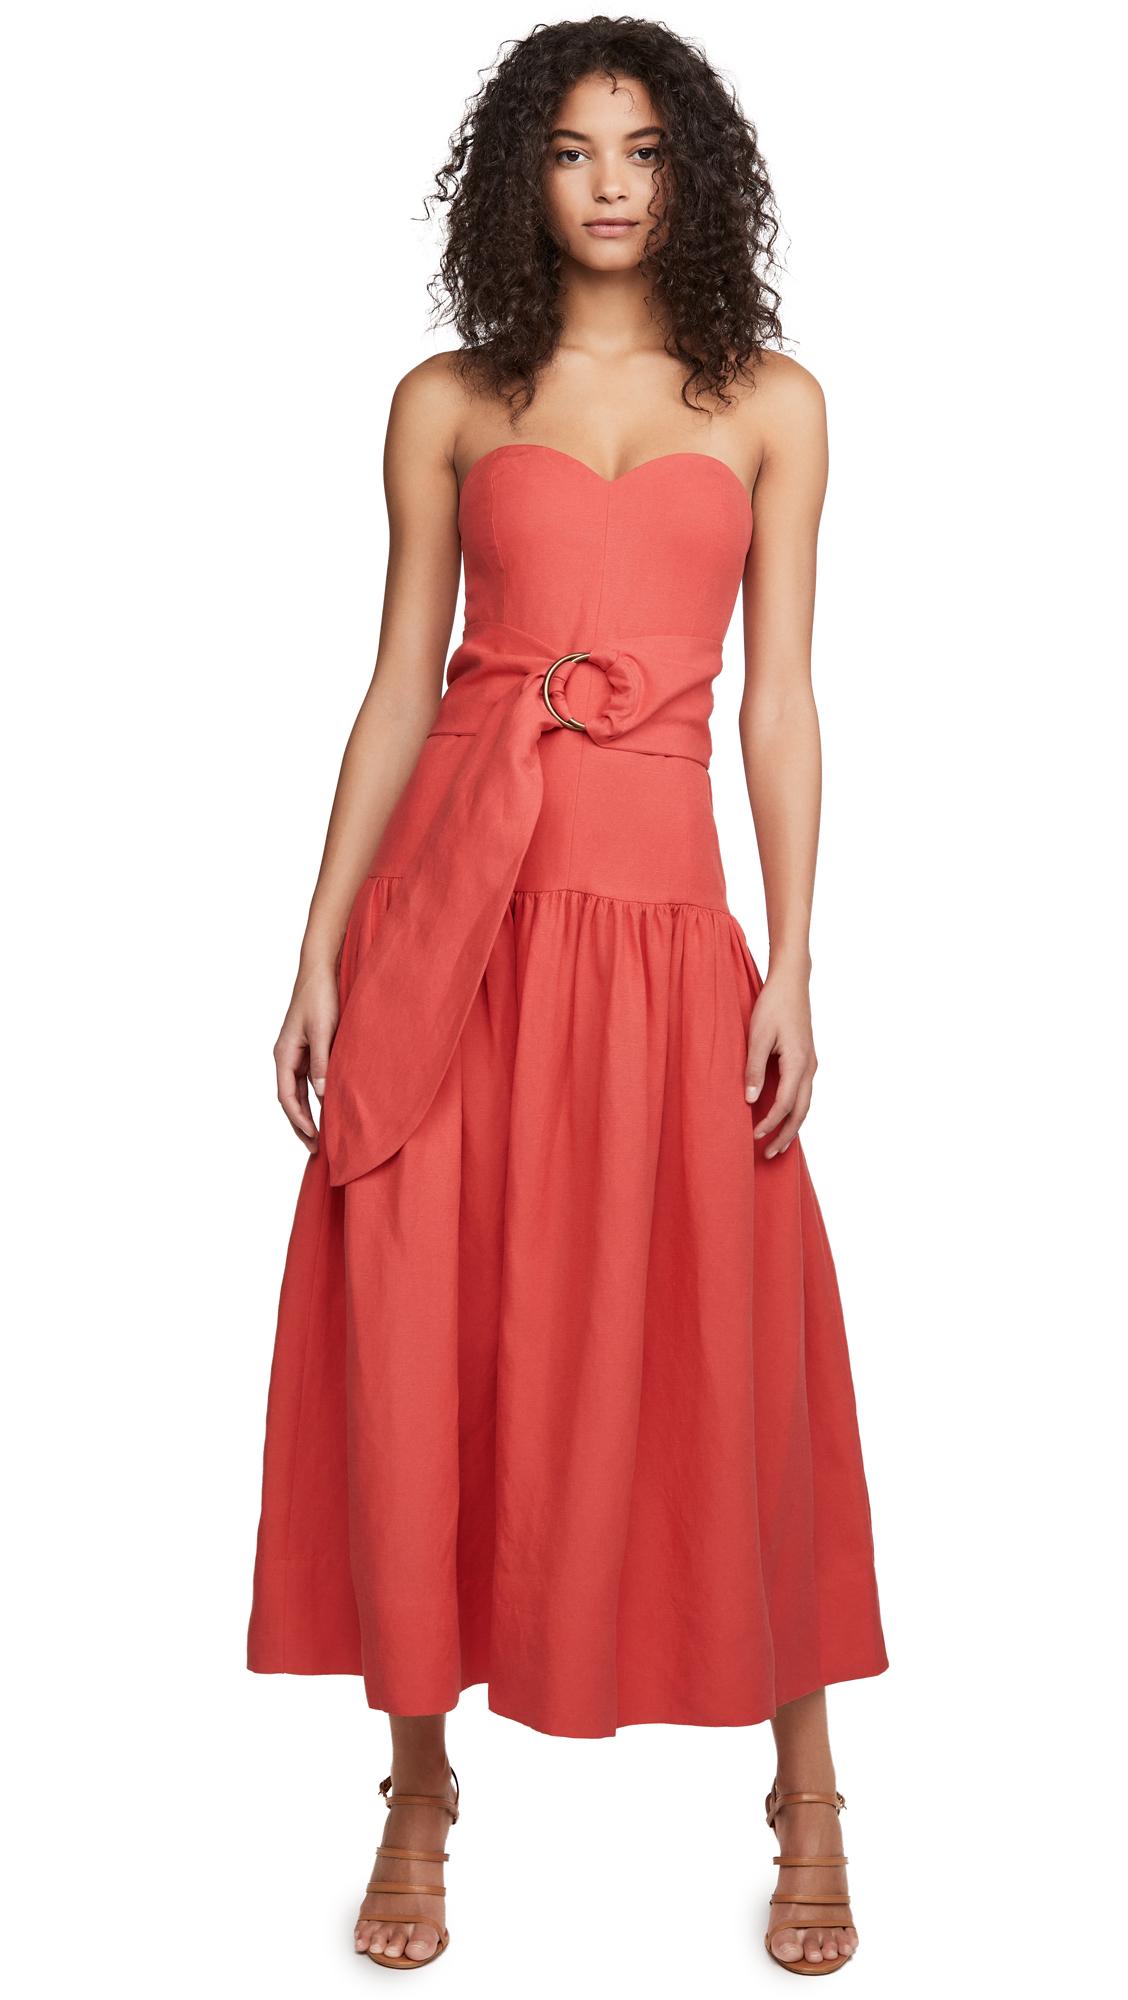 Mara Hoffman Augustina Dress – 30% Off Sale